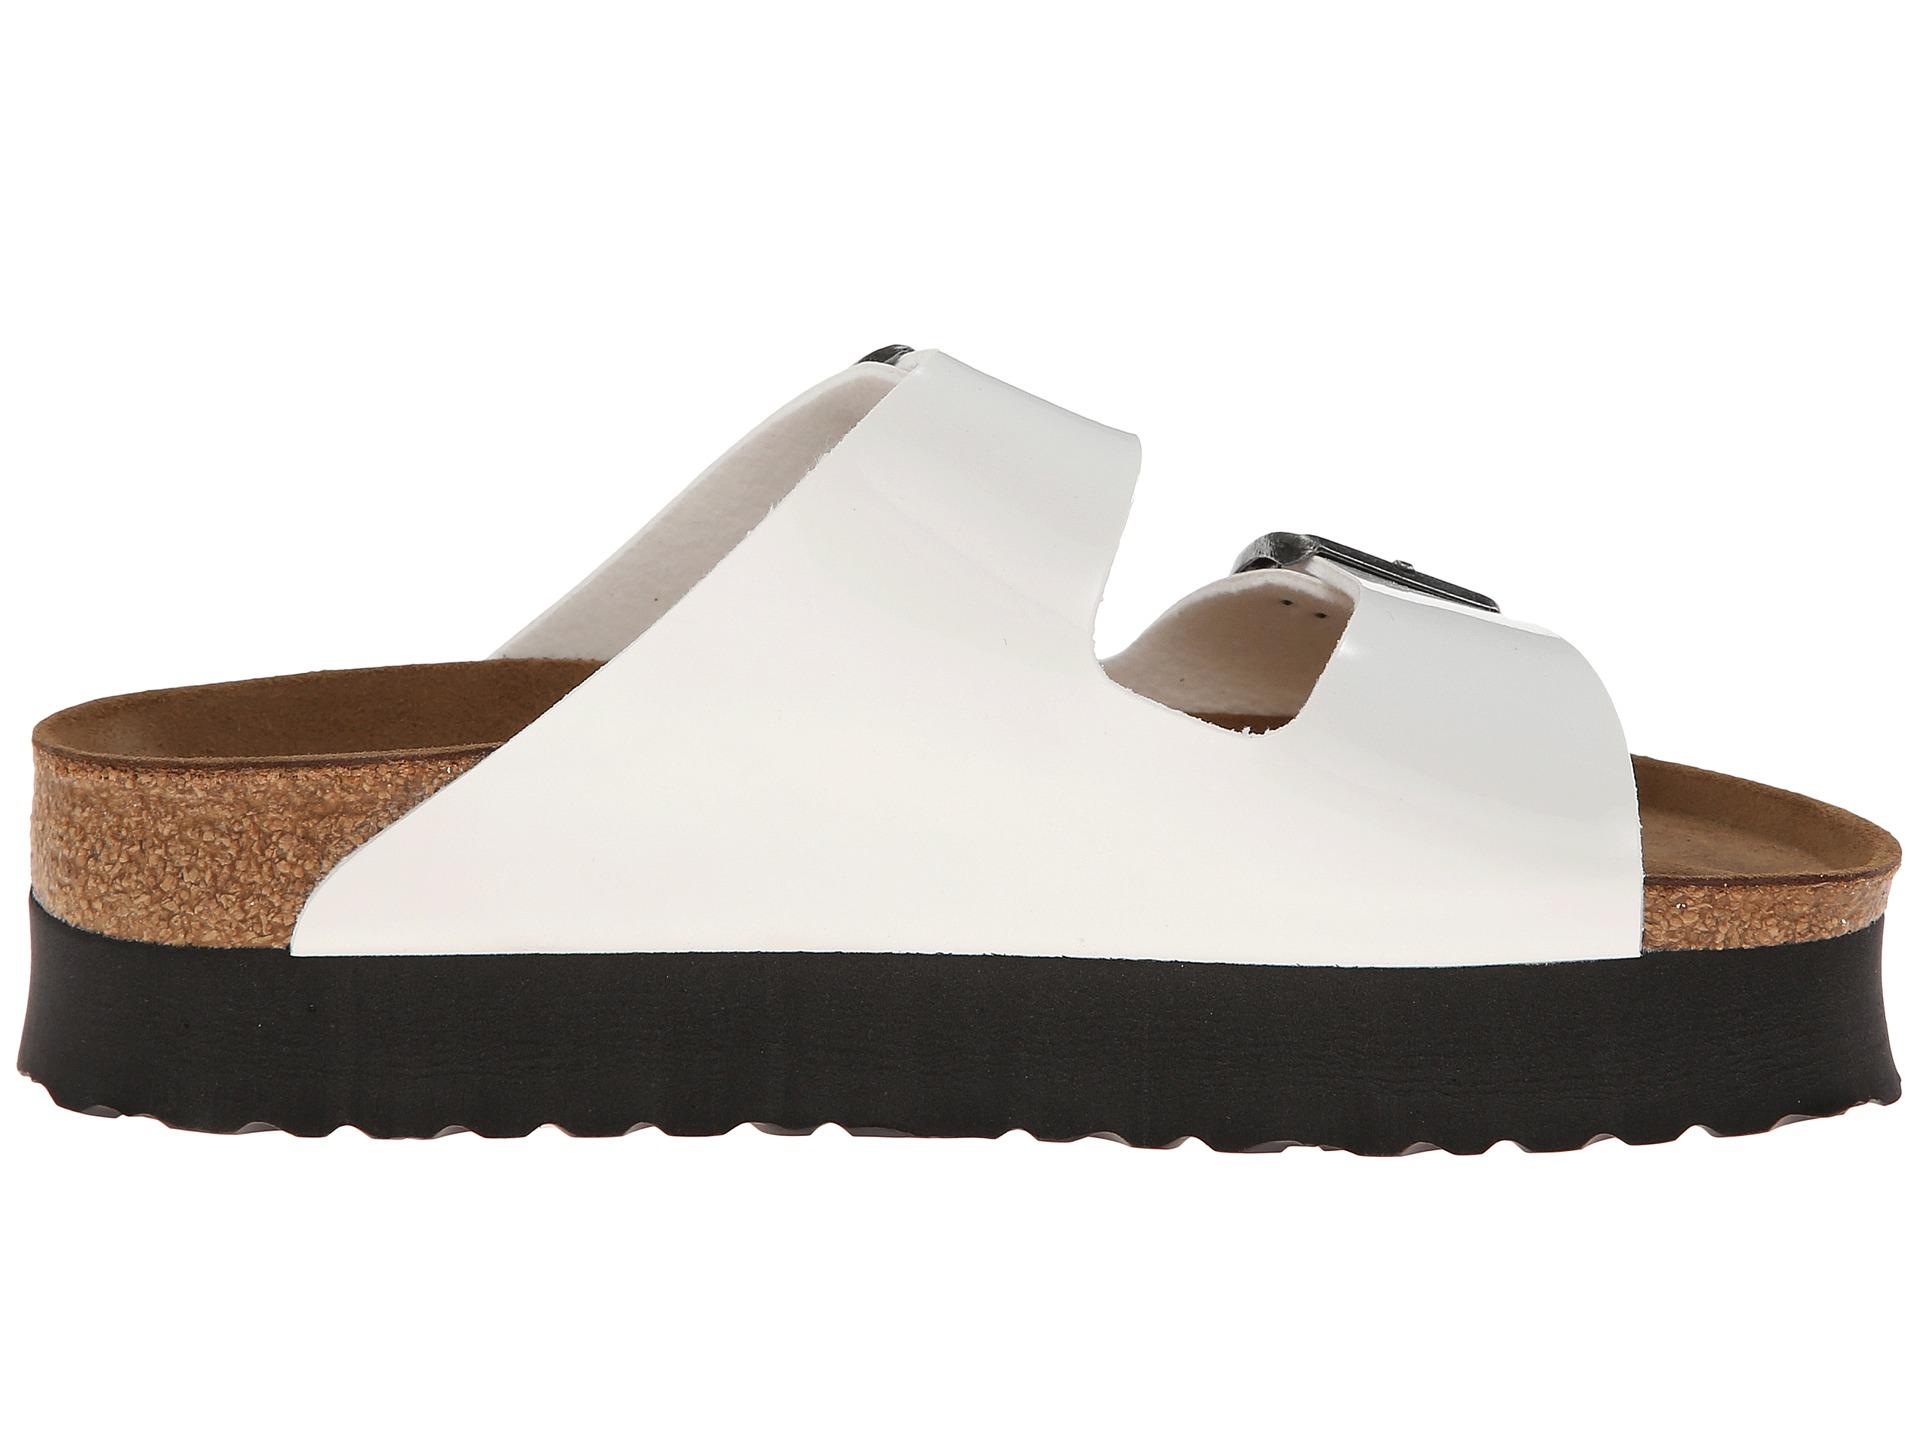 2866a10a76b Birkenstock Papillio Arizona Platform Sandals ✓ Shoes Style 2018